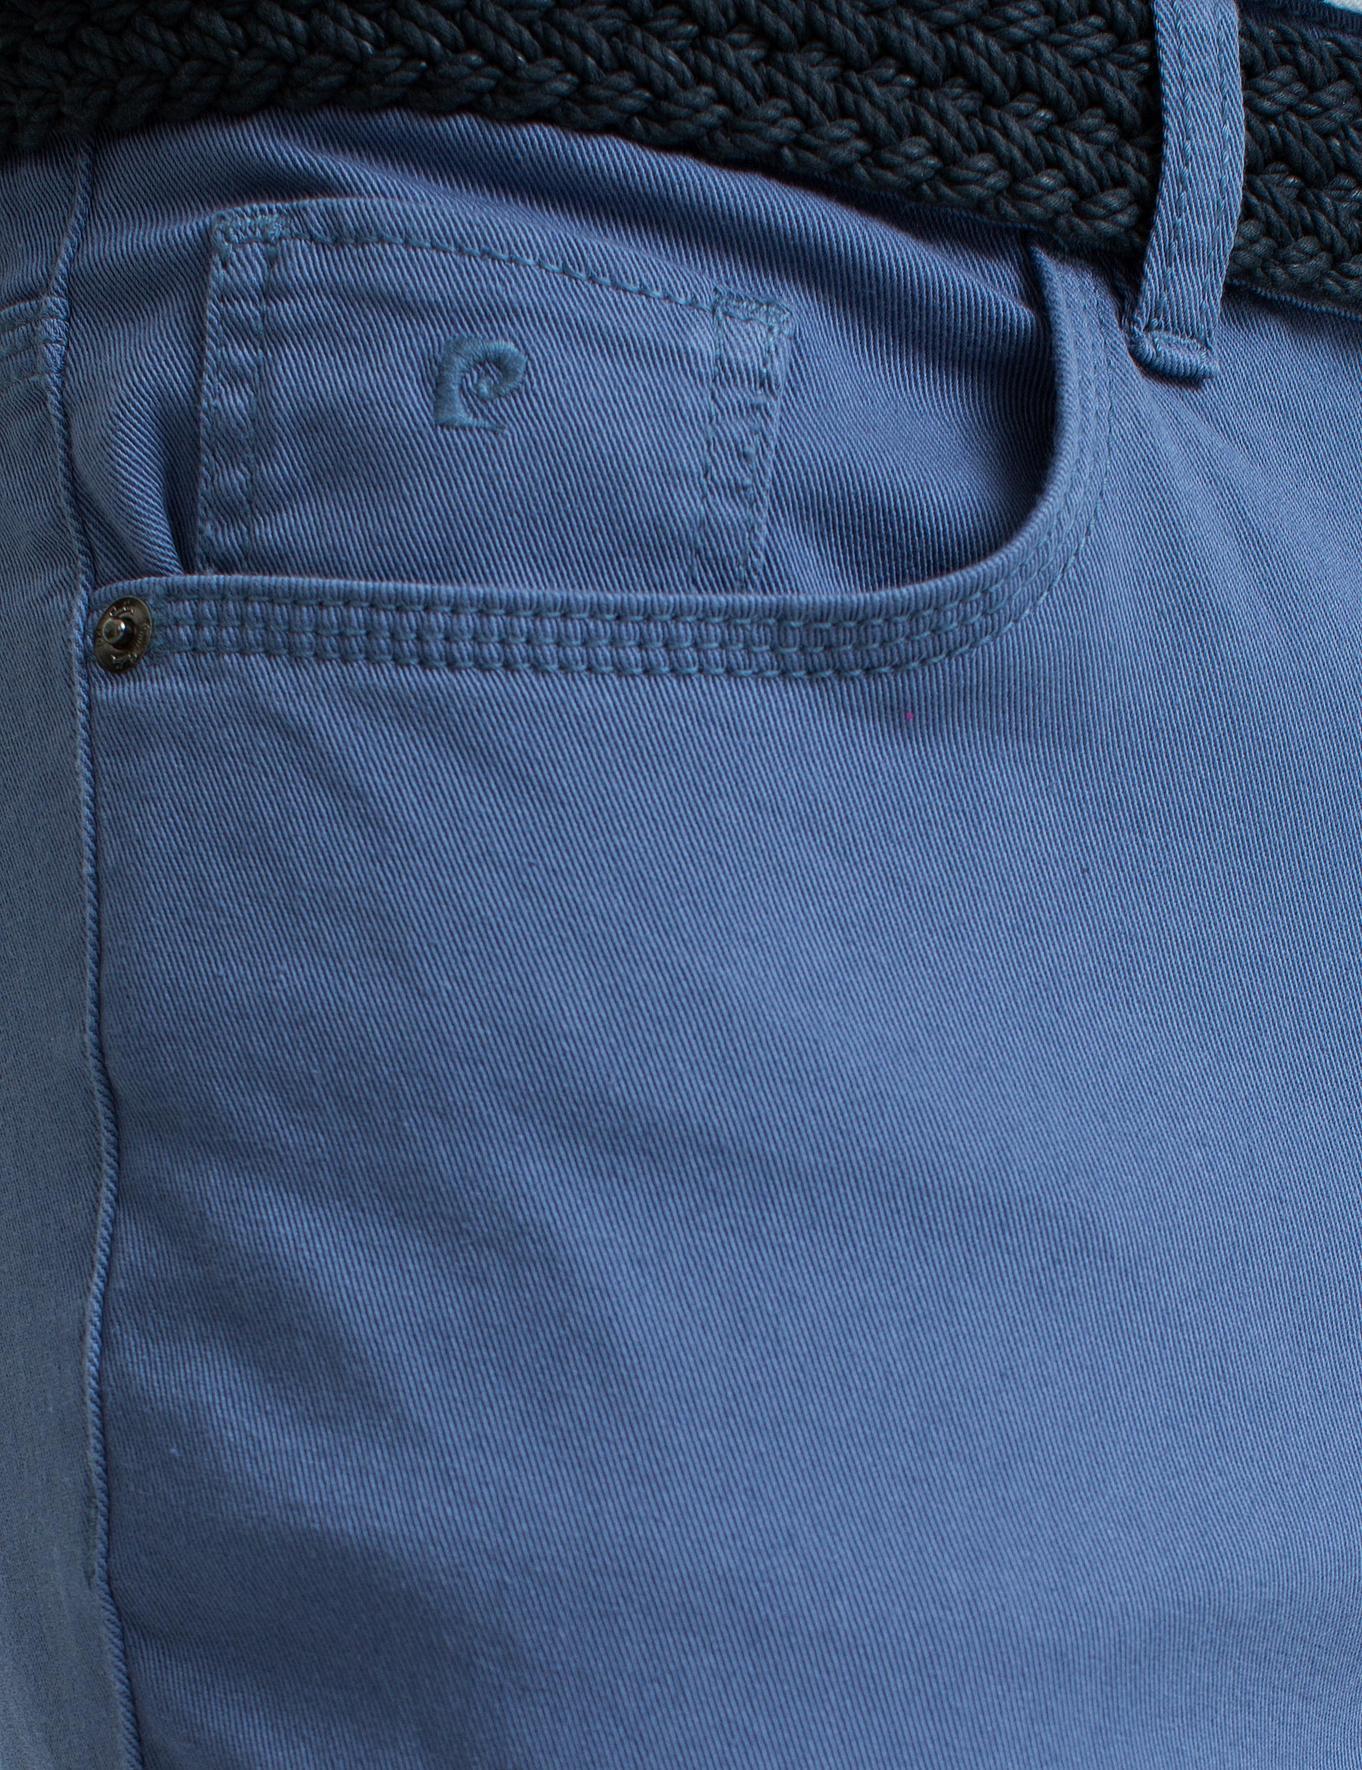 Petrol Mavi Slim Fit Chino Pantolon